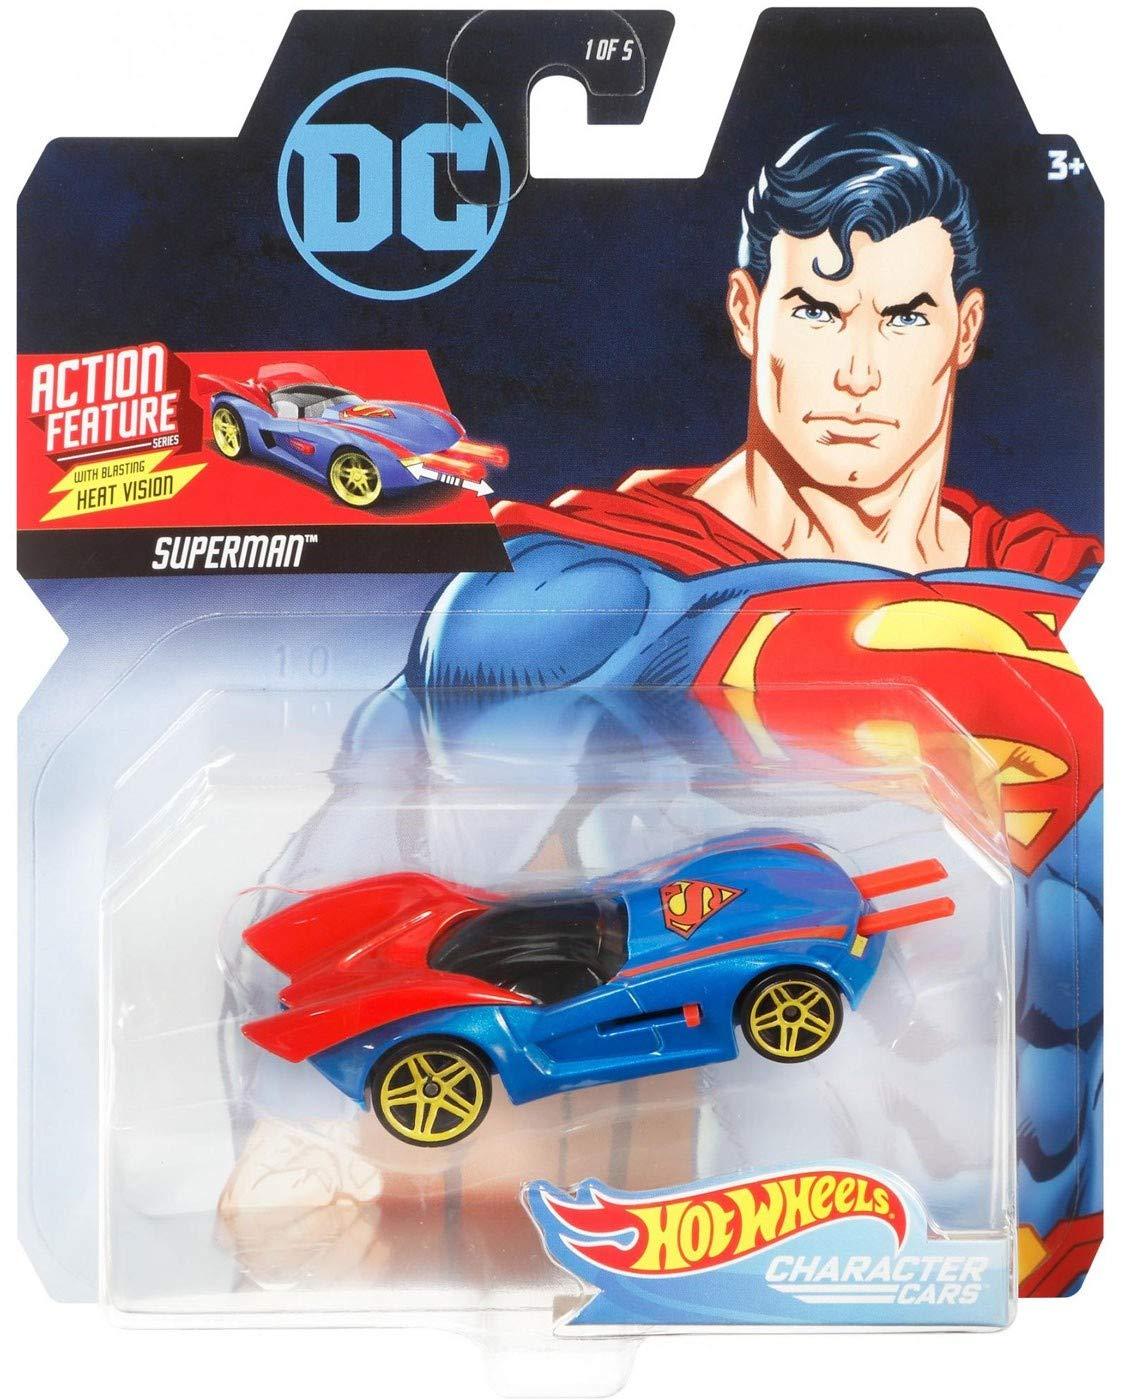 Superman (Action Feature)